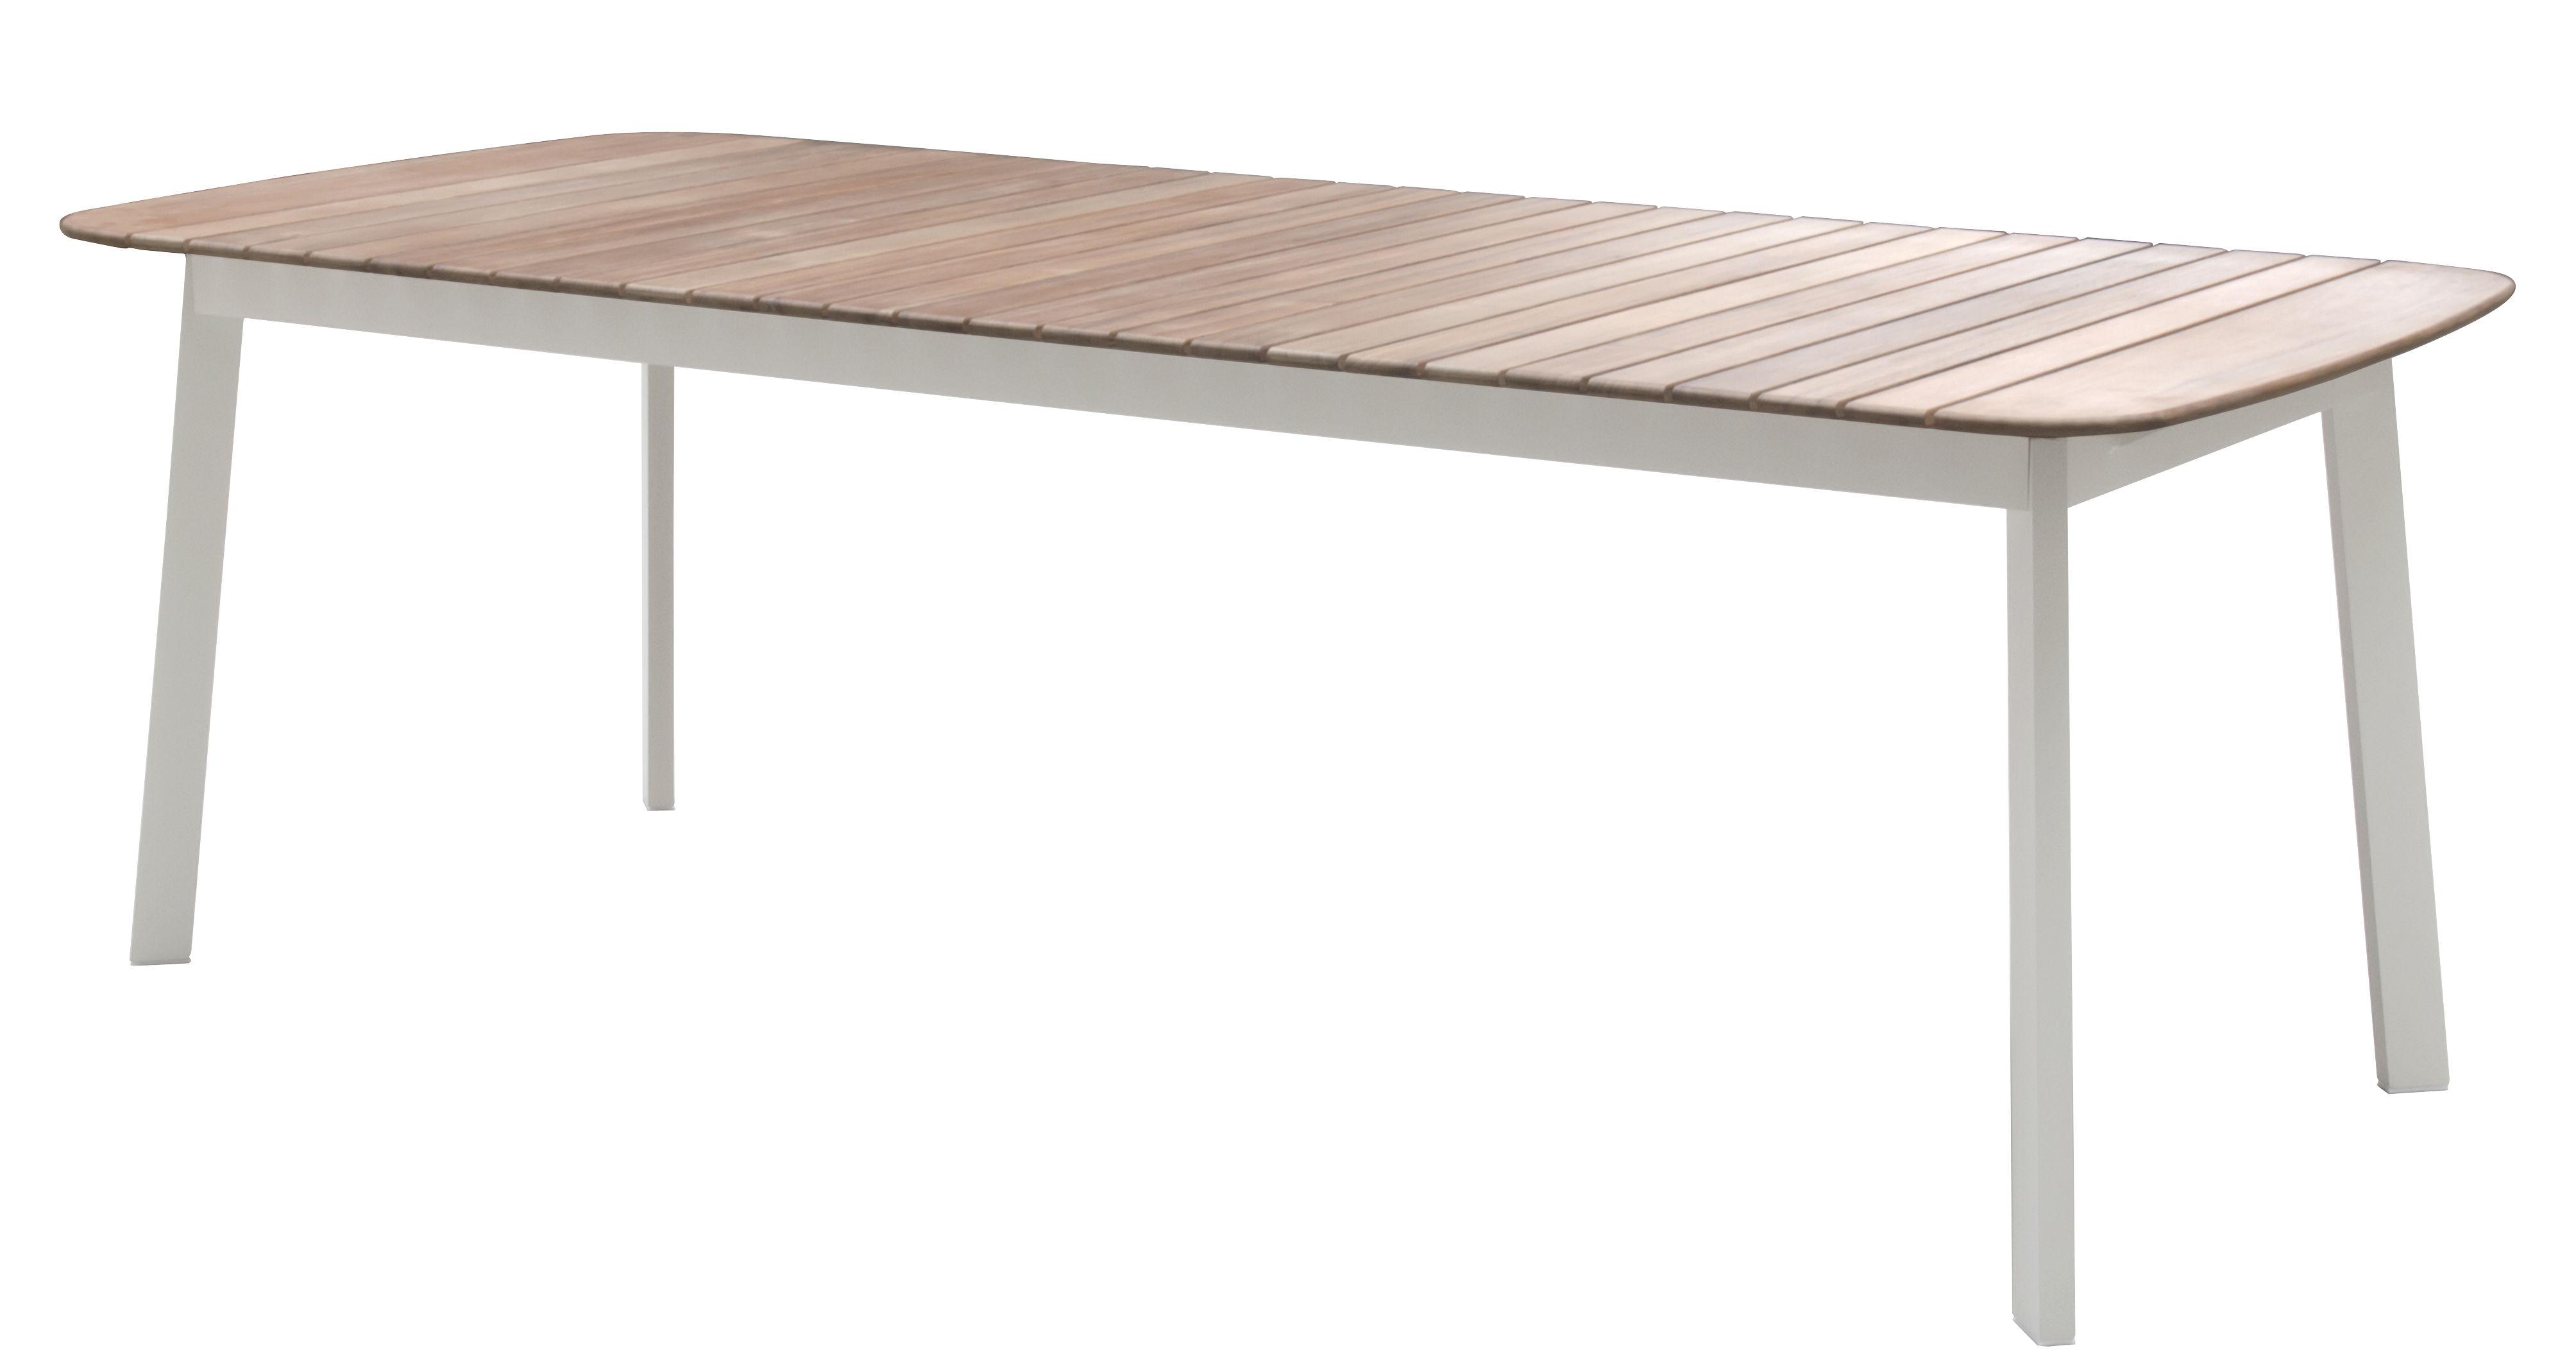 table shine plateau teck 225 x 100 cm blanc plateau teck emu made in design. Black Bedroom Furniture Sets. Home Design Ideas